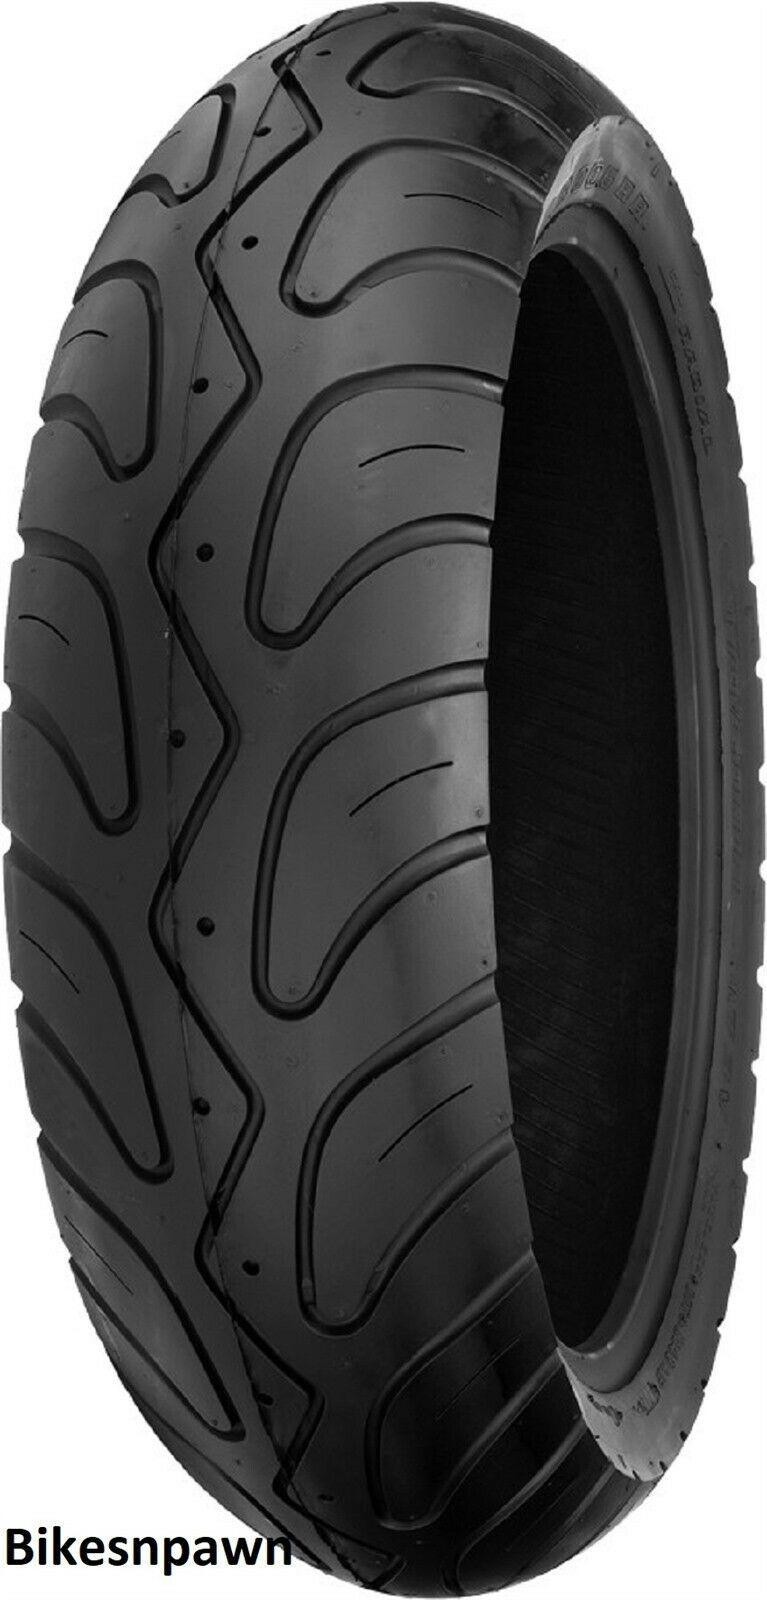 New Shinko 006 Podium Radial 170/60ZR17 Rear Motorcycle Performance Tire 72W